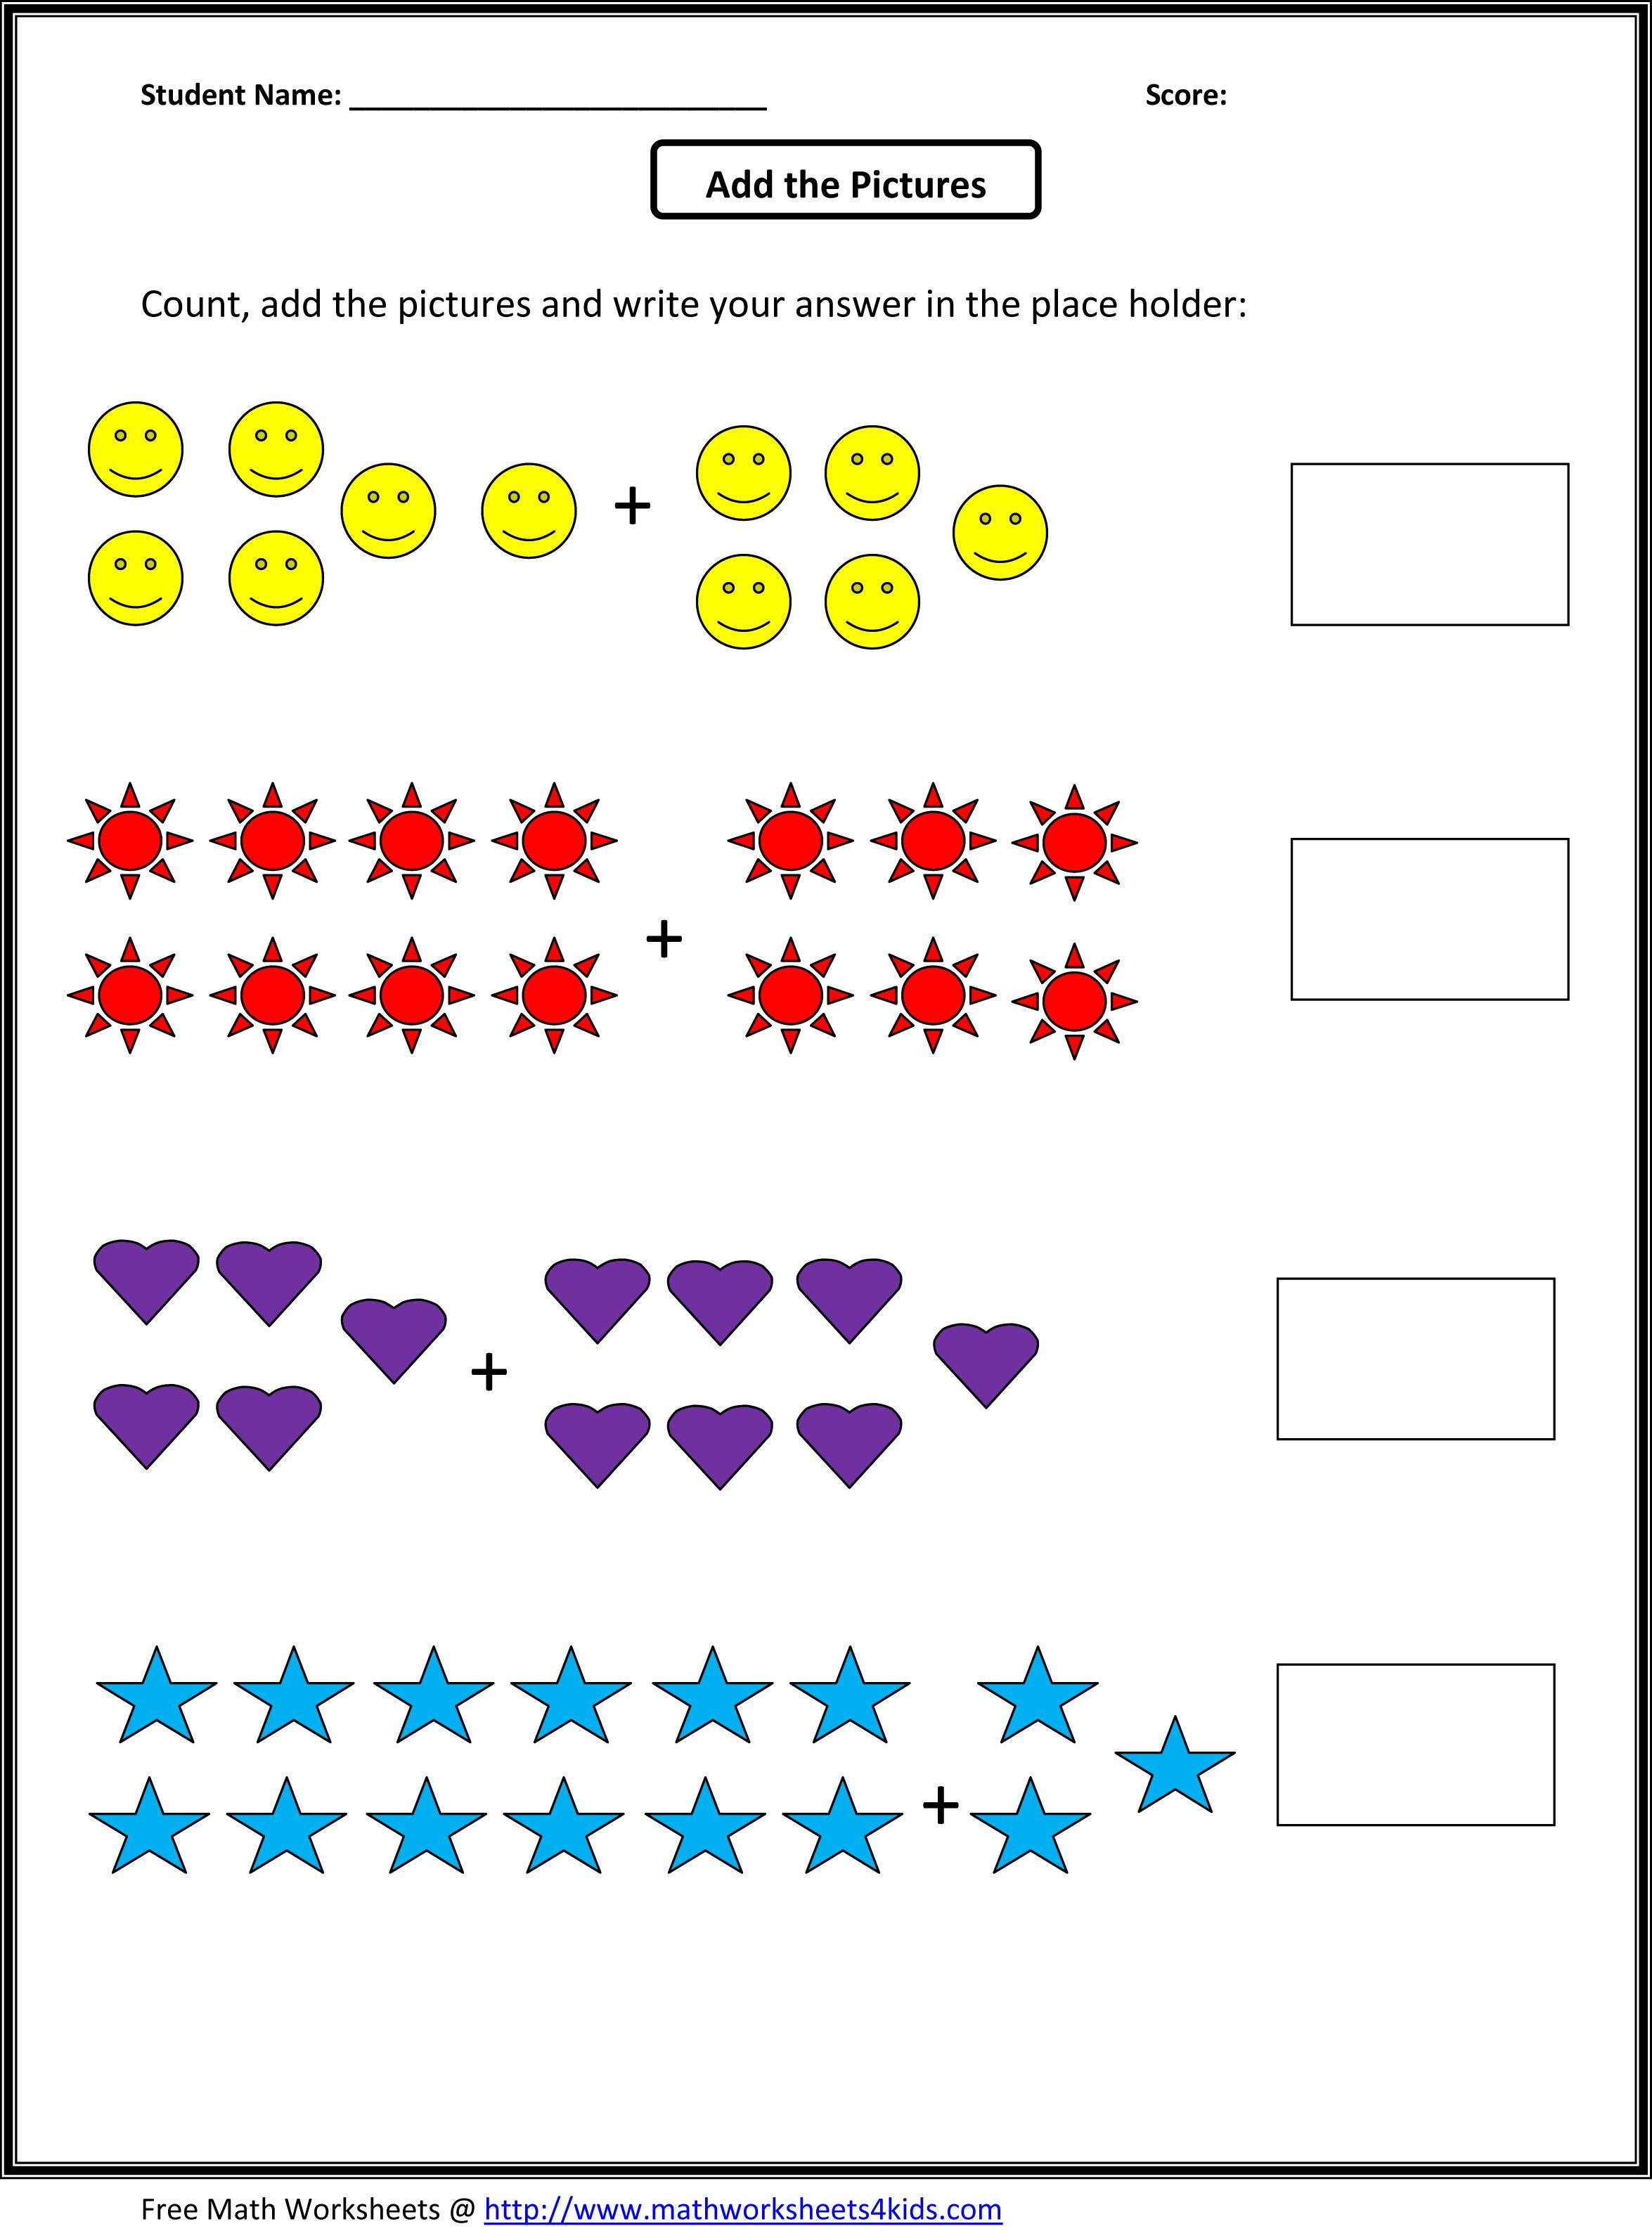 Grade 1 Addition Math Worksheets | First Grade Math Worksheets | Printable Math Worksheets For Grade 1